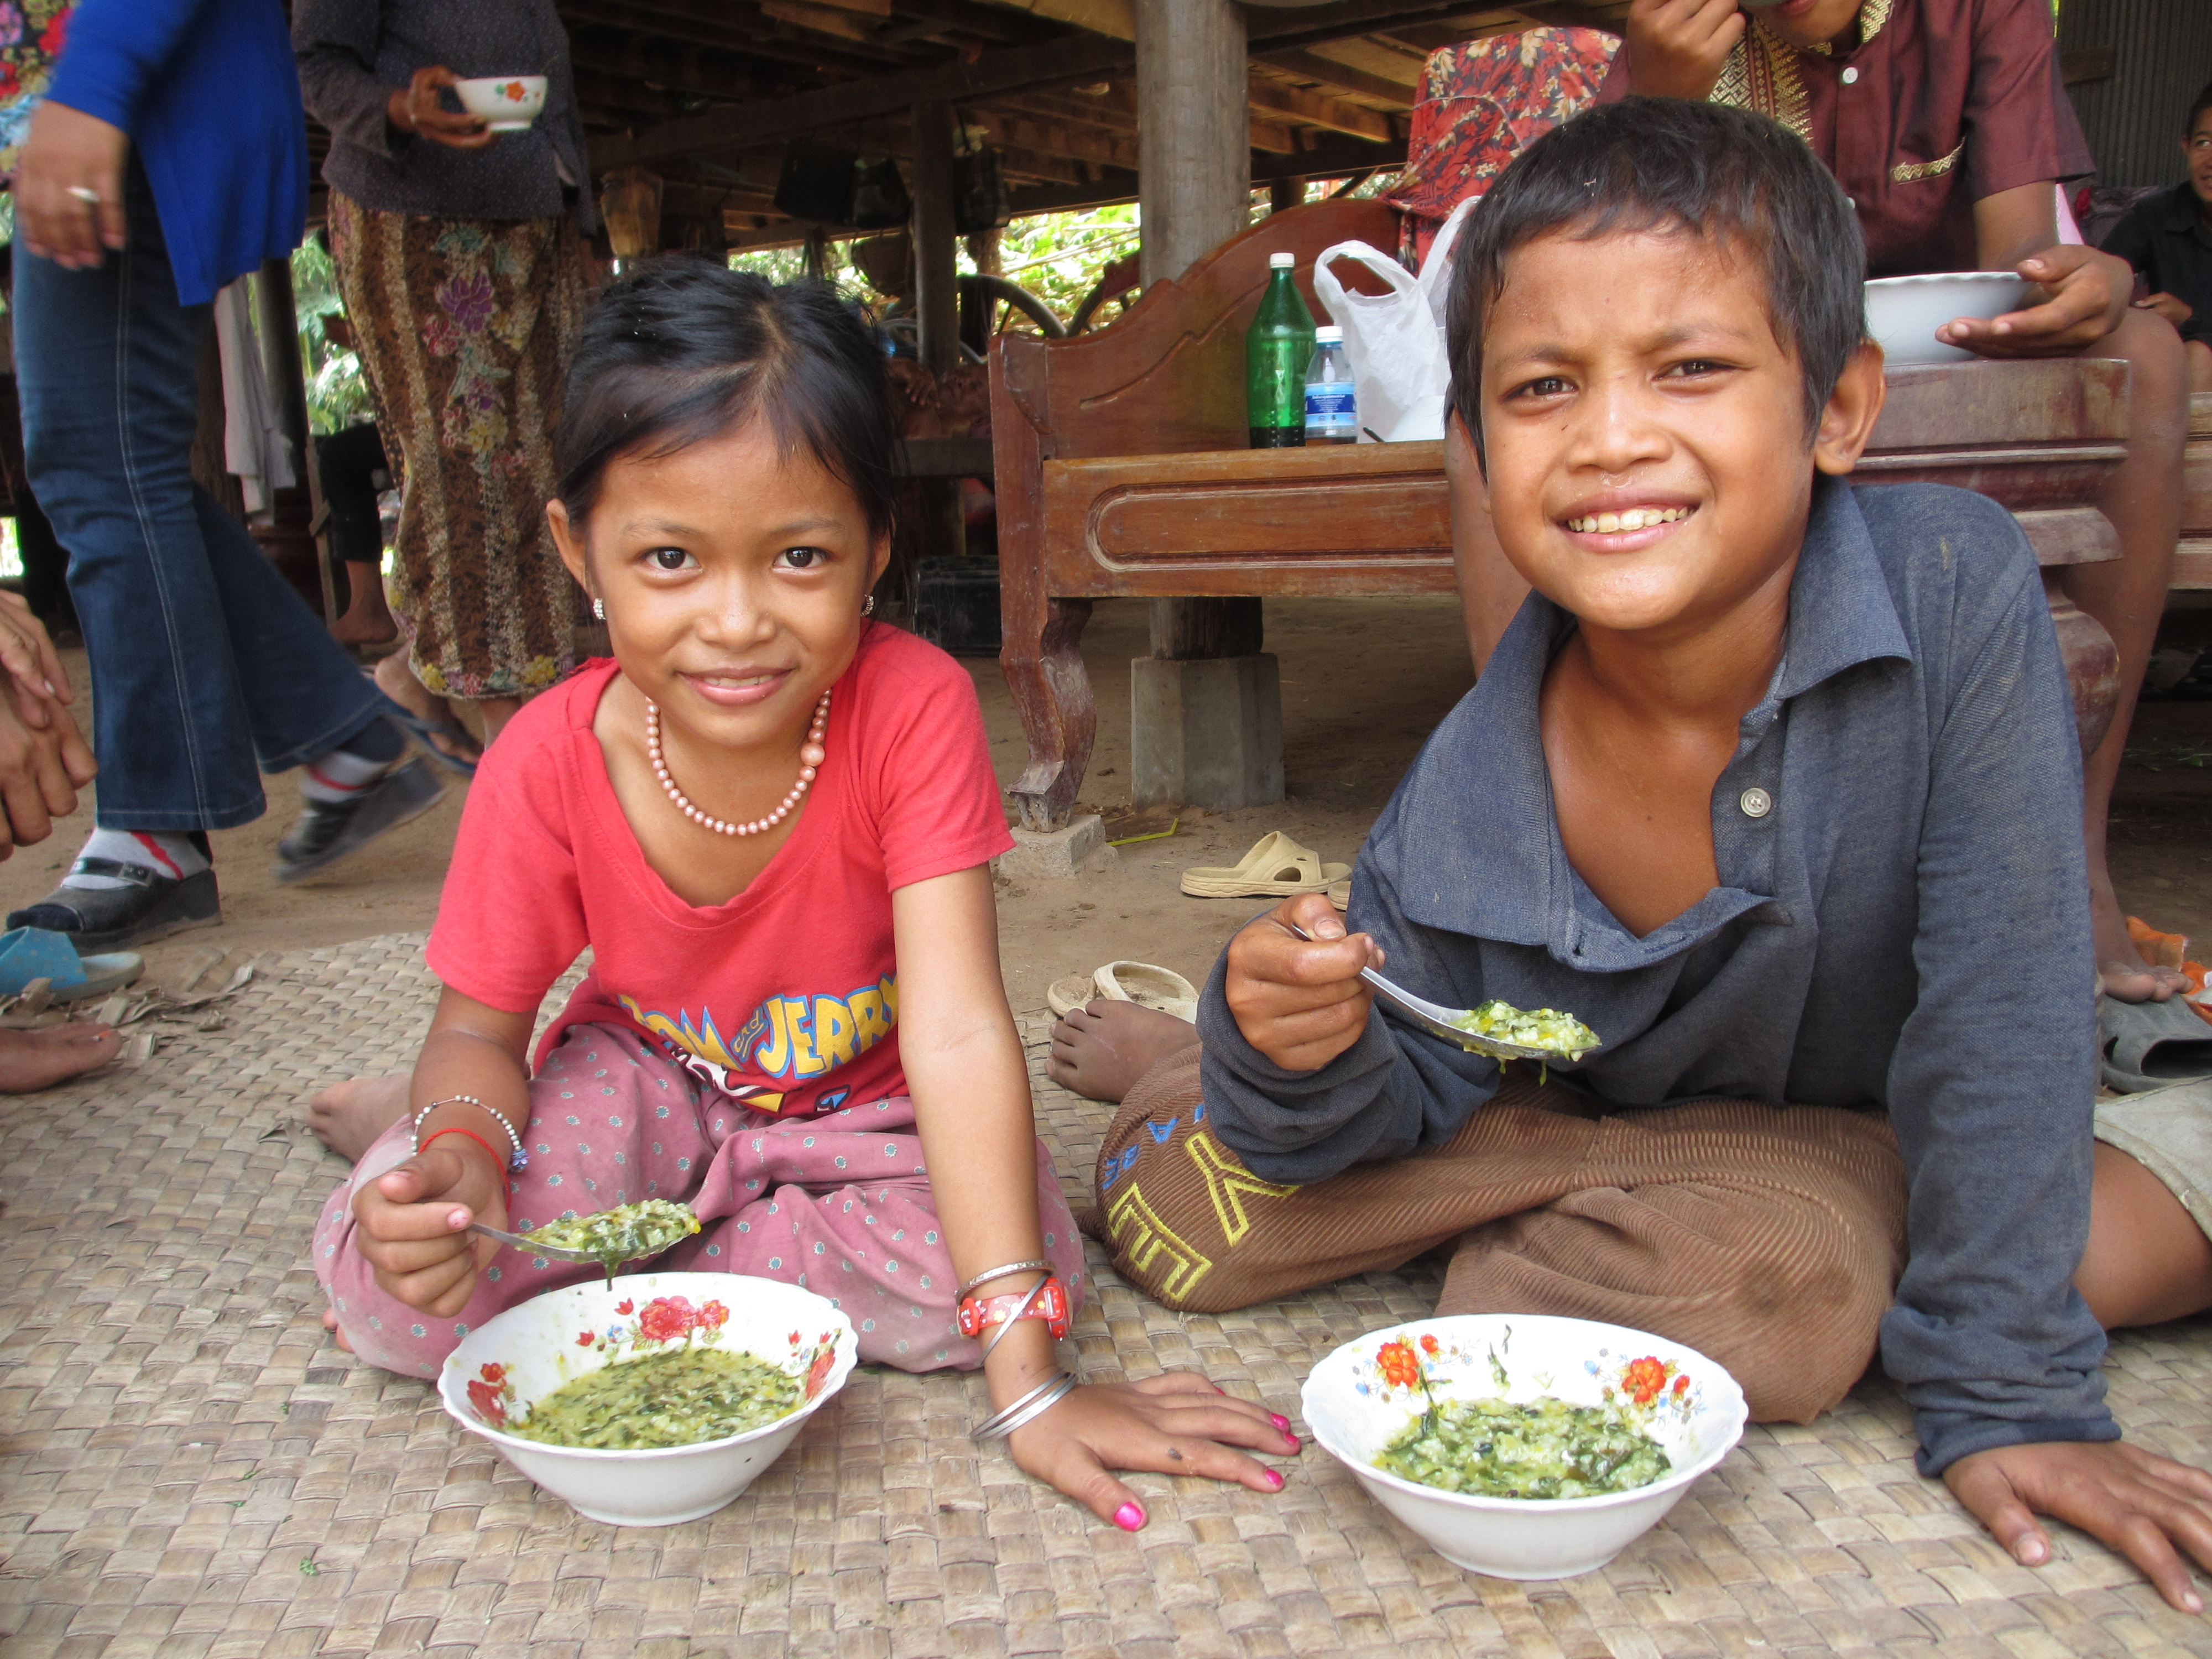 Can we reach zero poverty? These ways work | ShareAmerica